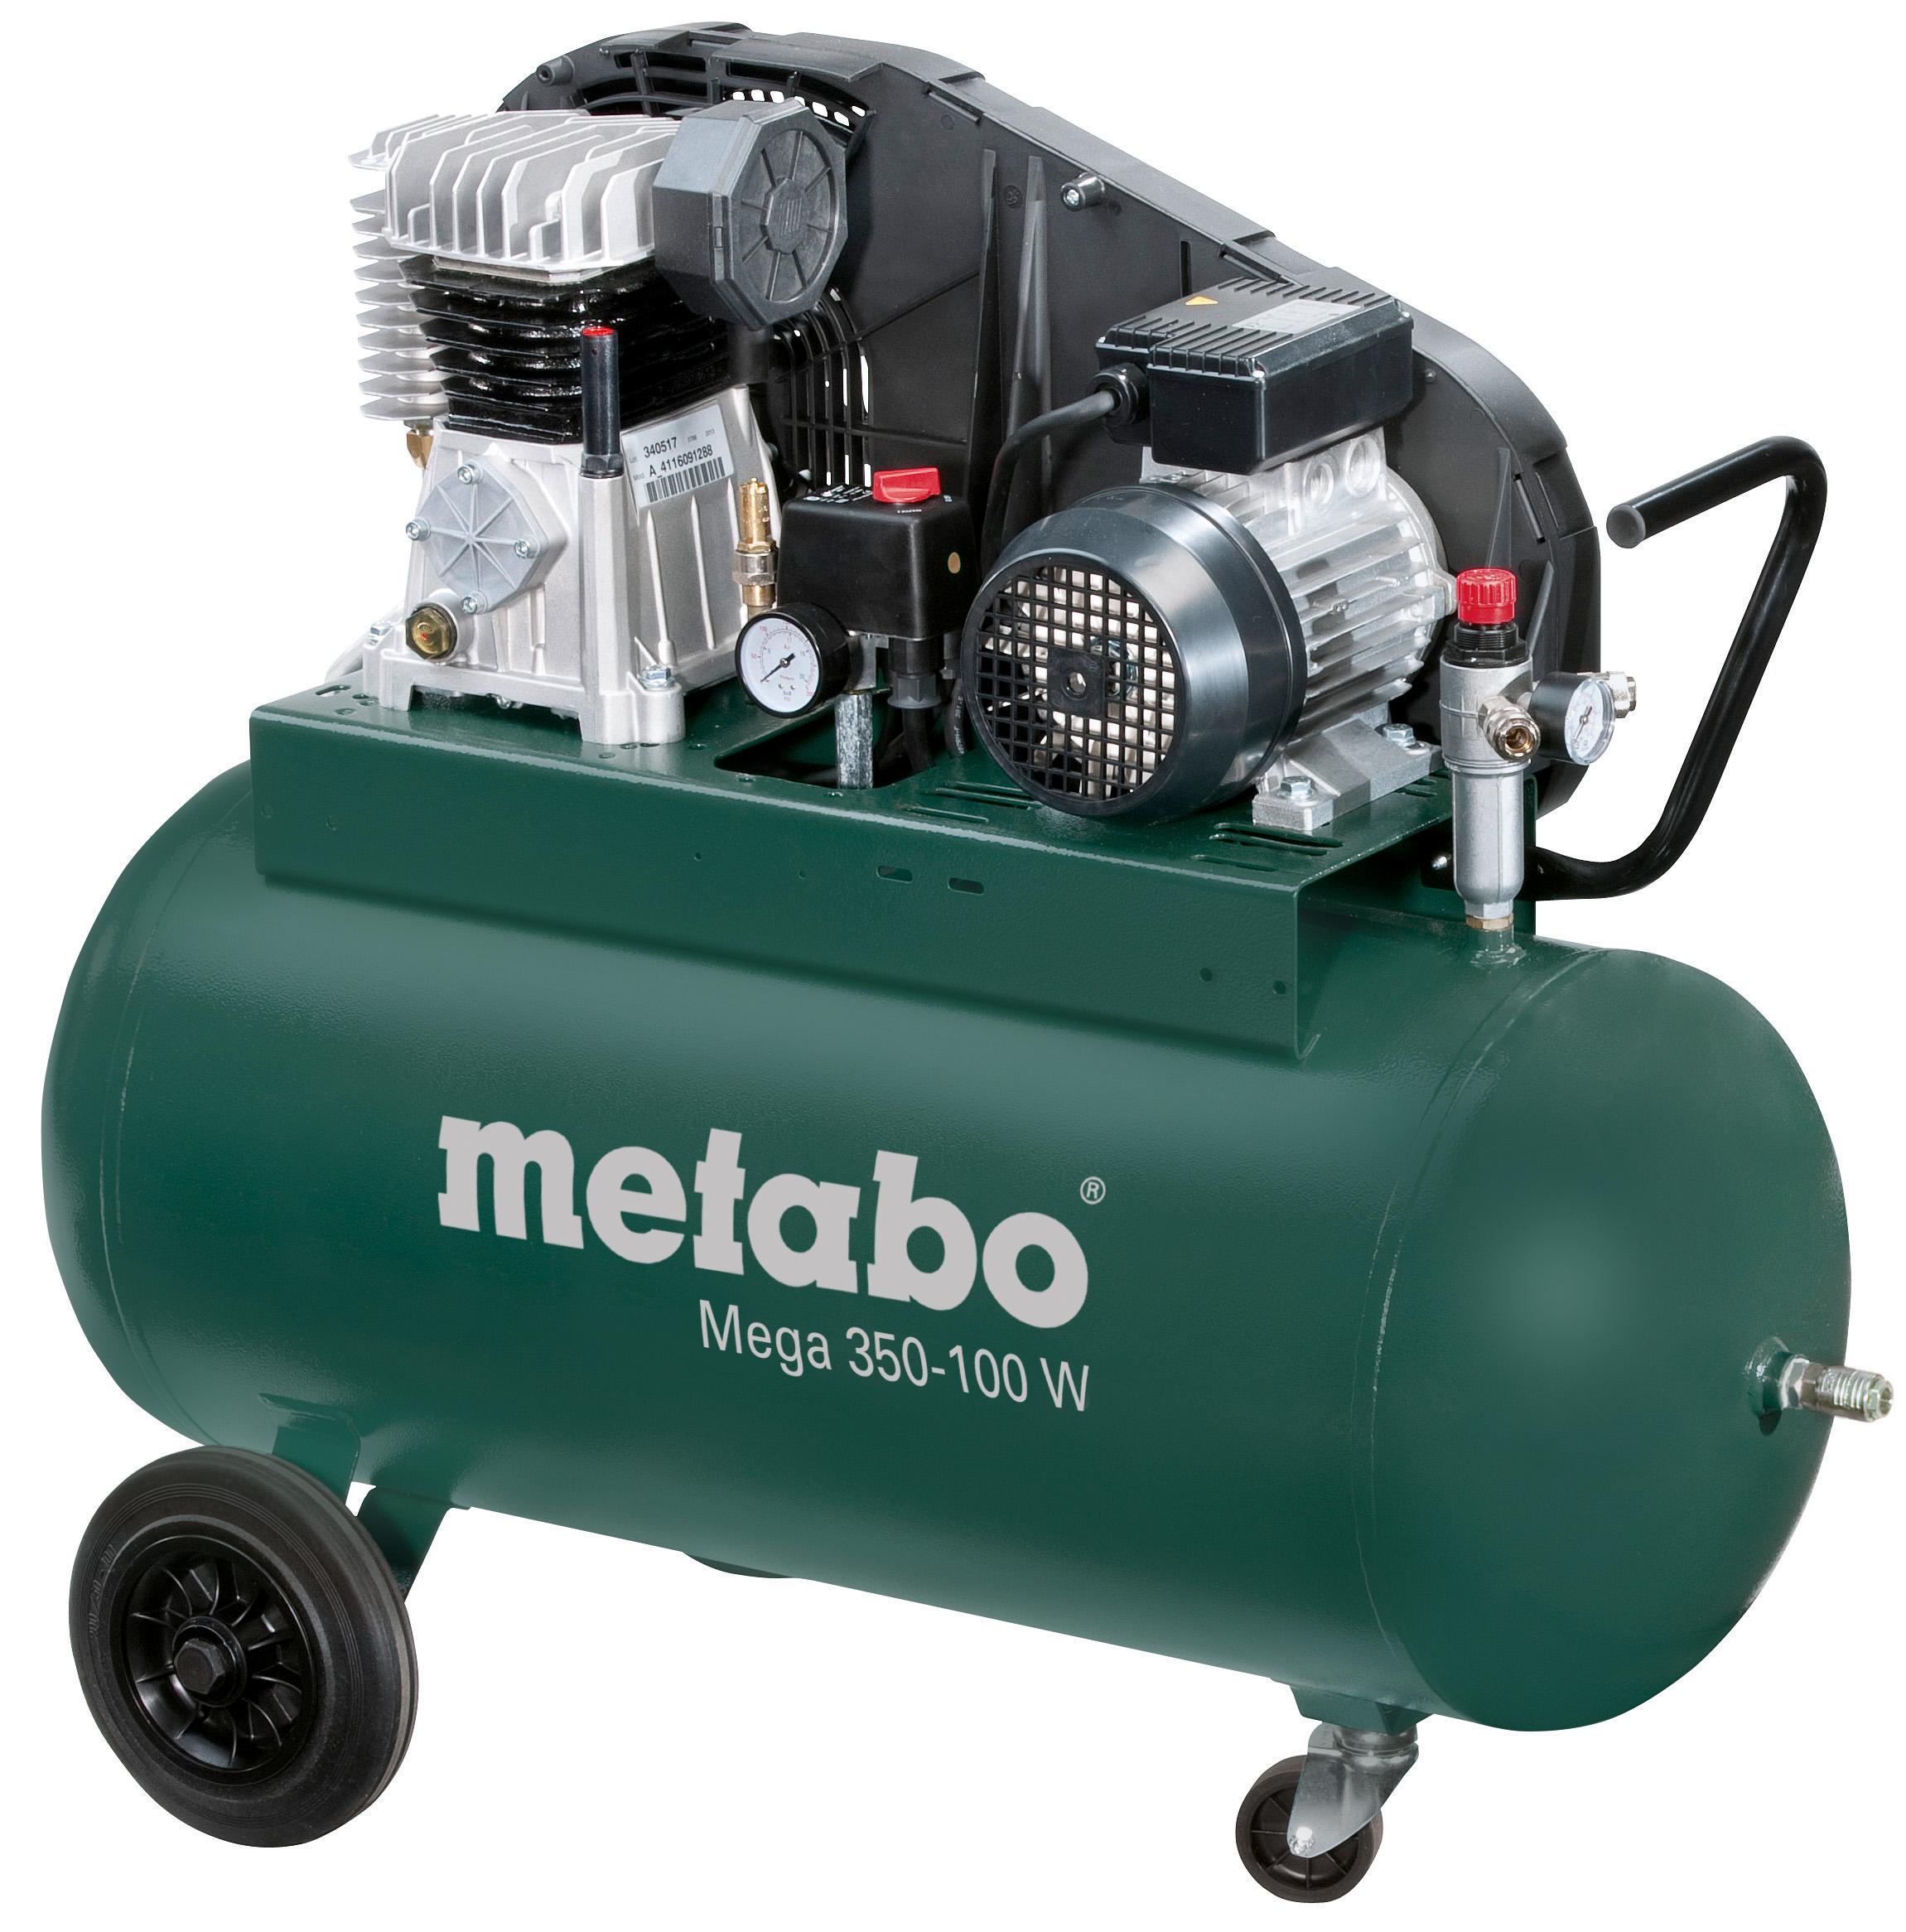 ���������� ��������� Metabo Mega 350-100 d